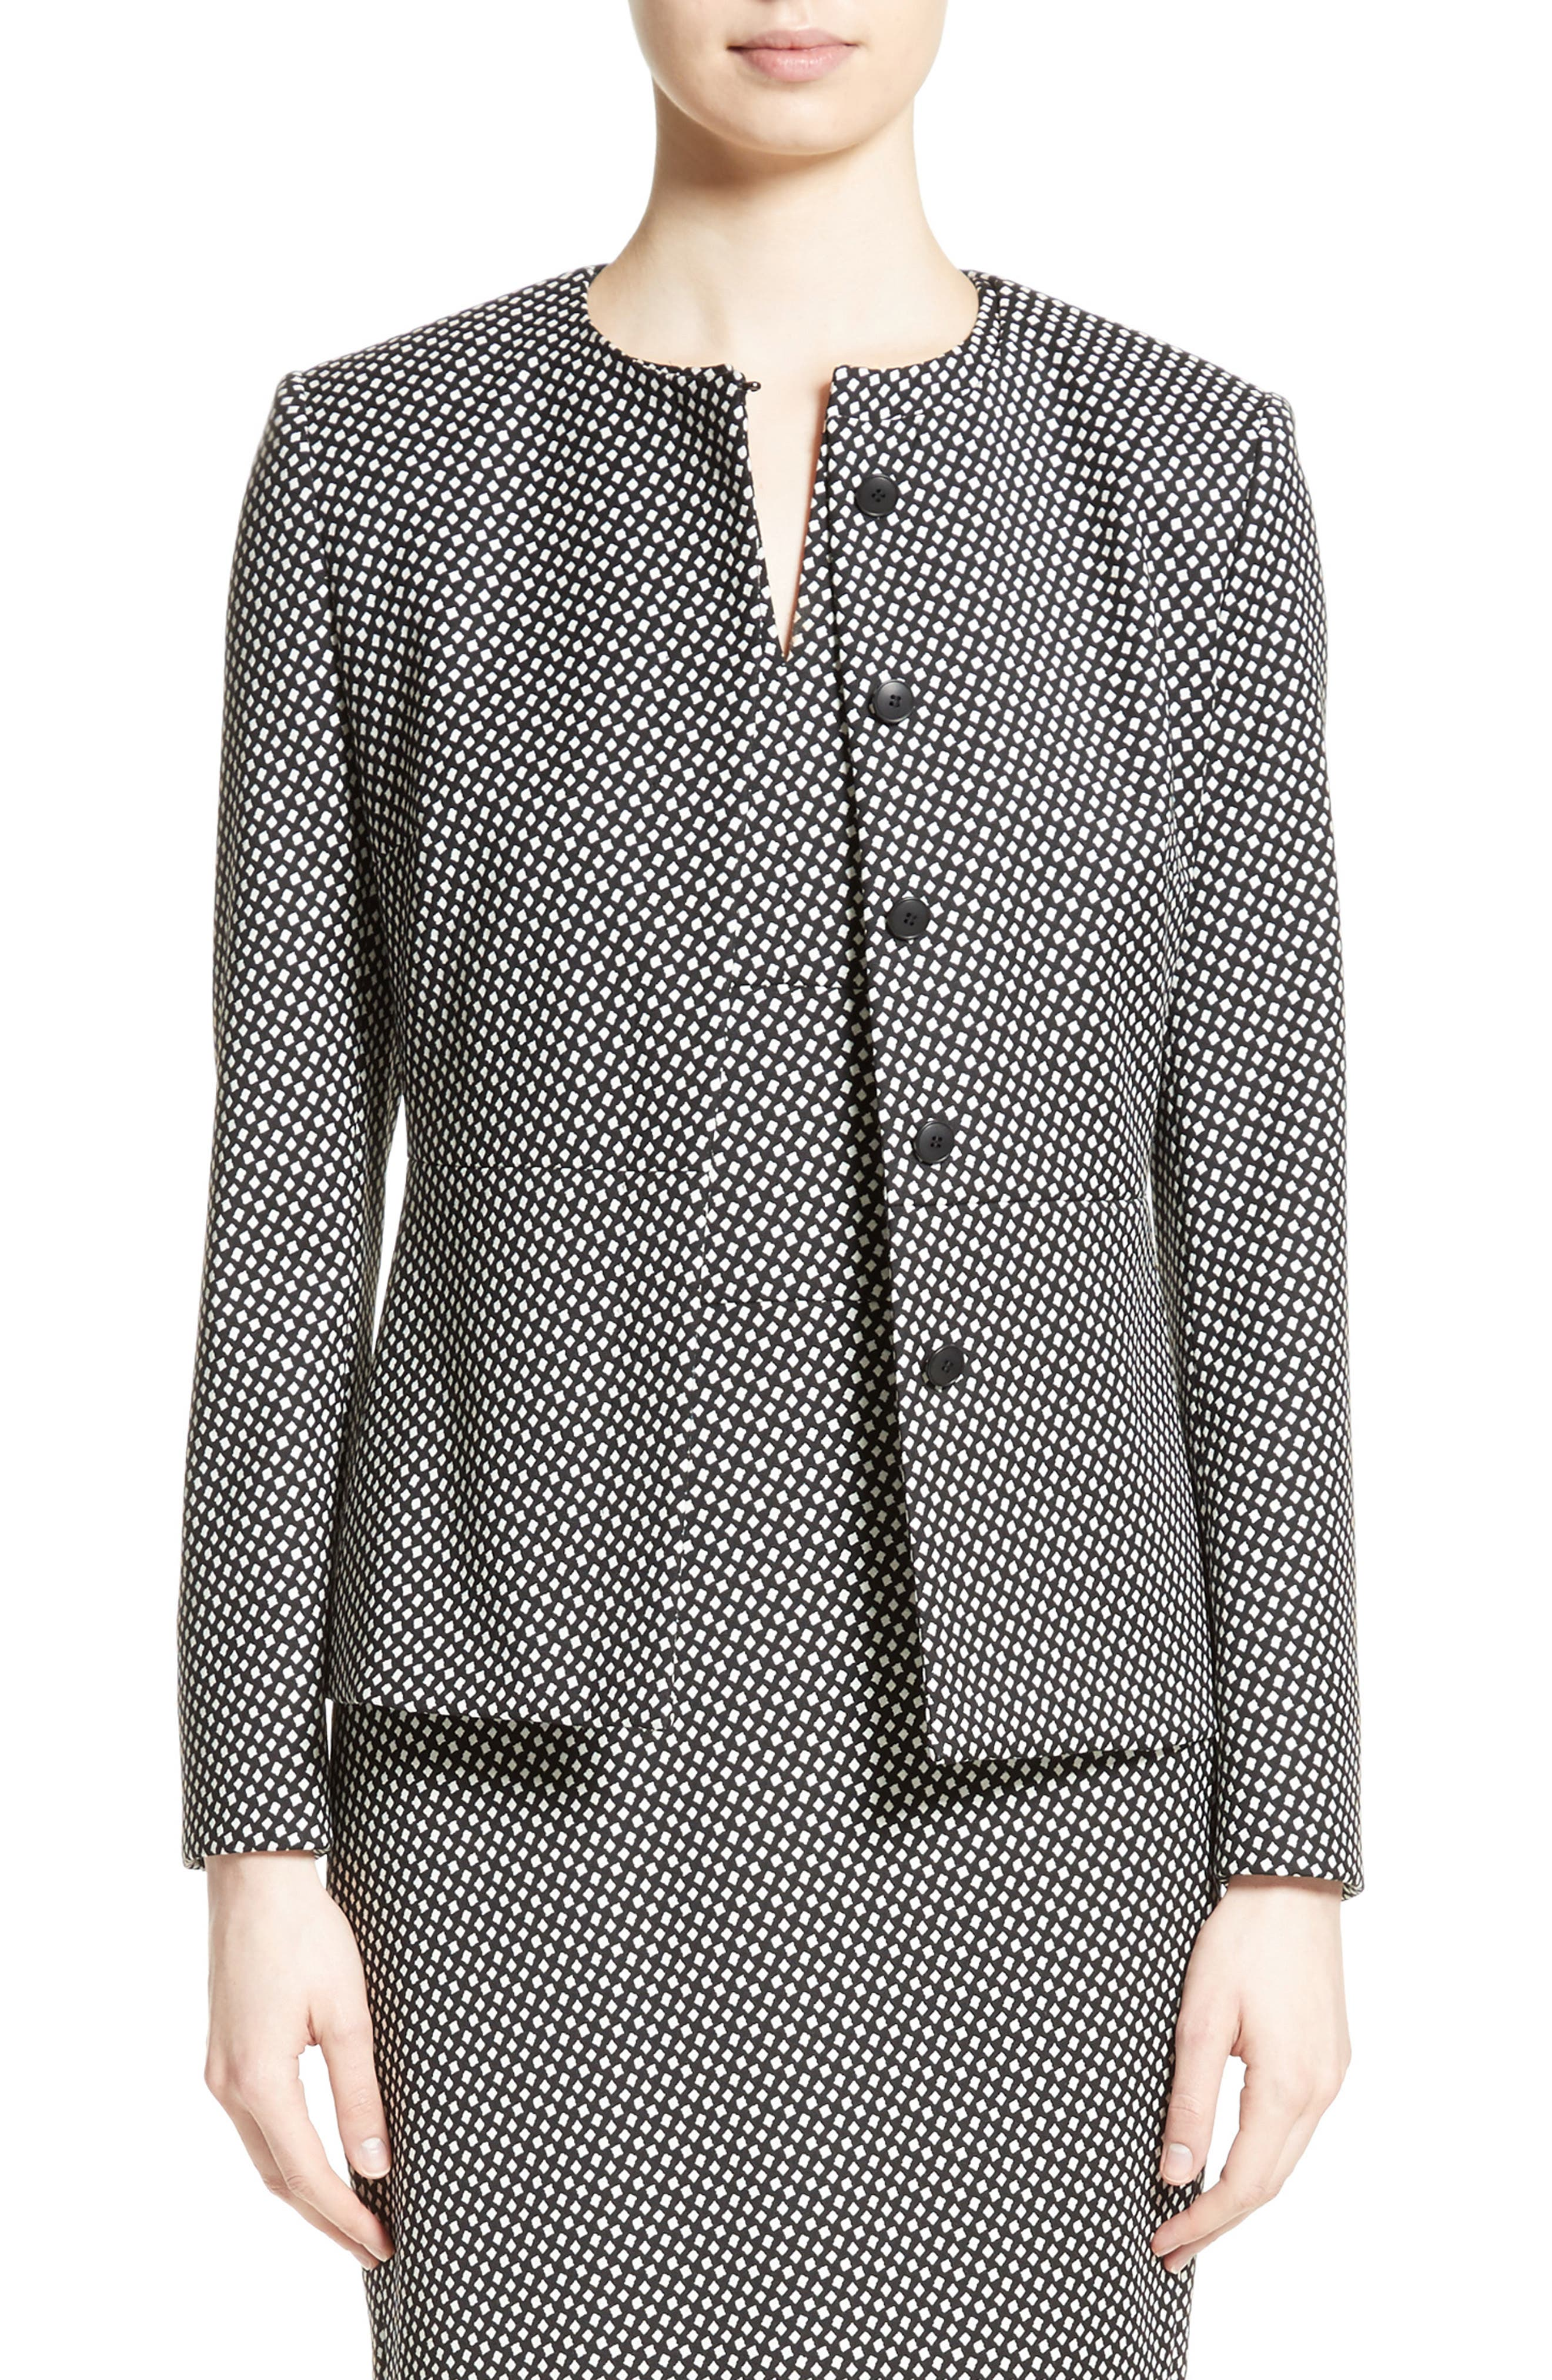 Ajaccio Wool Blend Jacquard Jacket,                         Main,                         color, 001